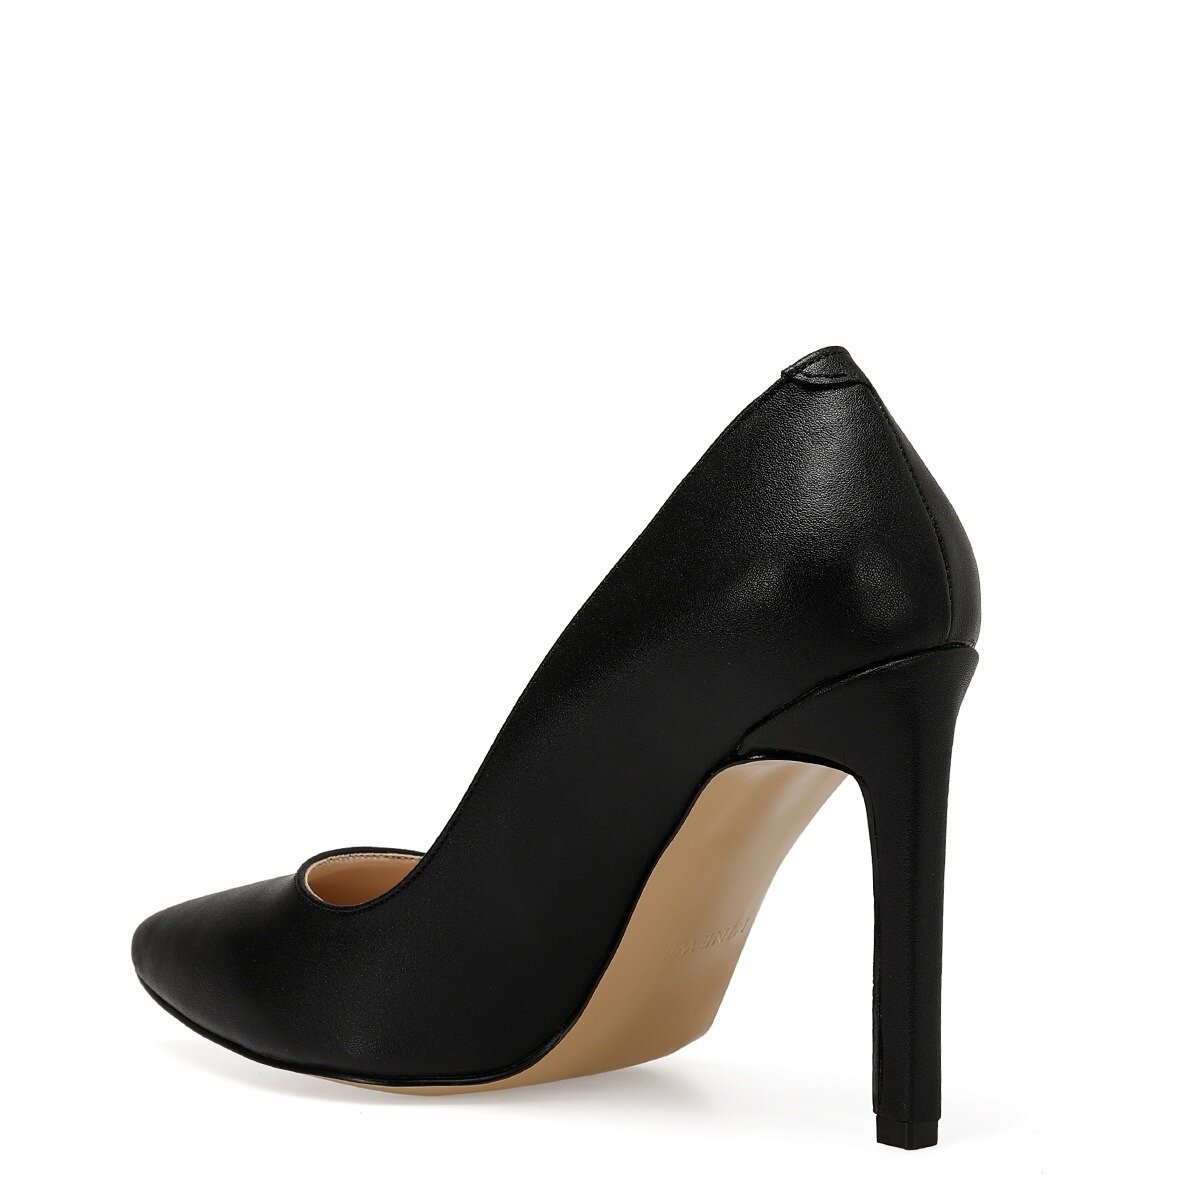 RAINA Siyah Kadın Stiletto